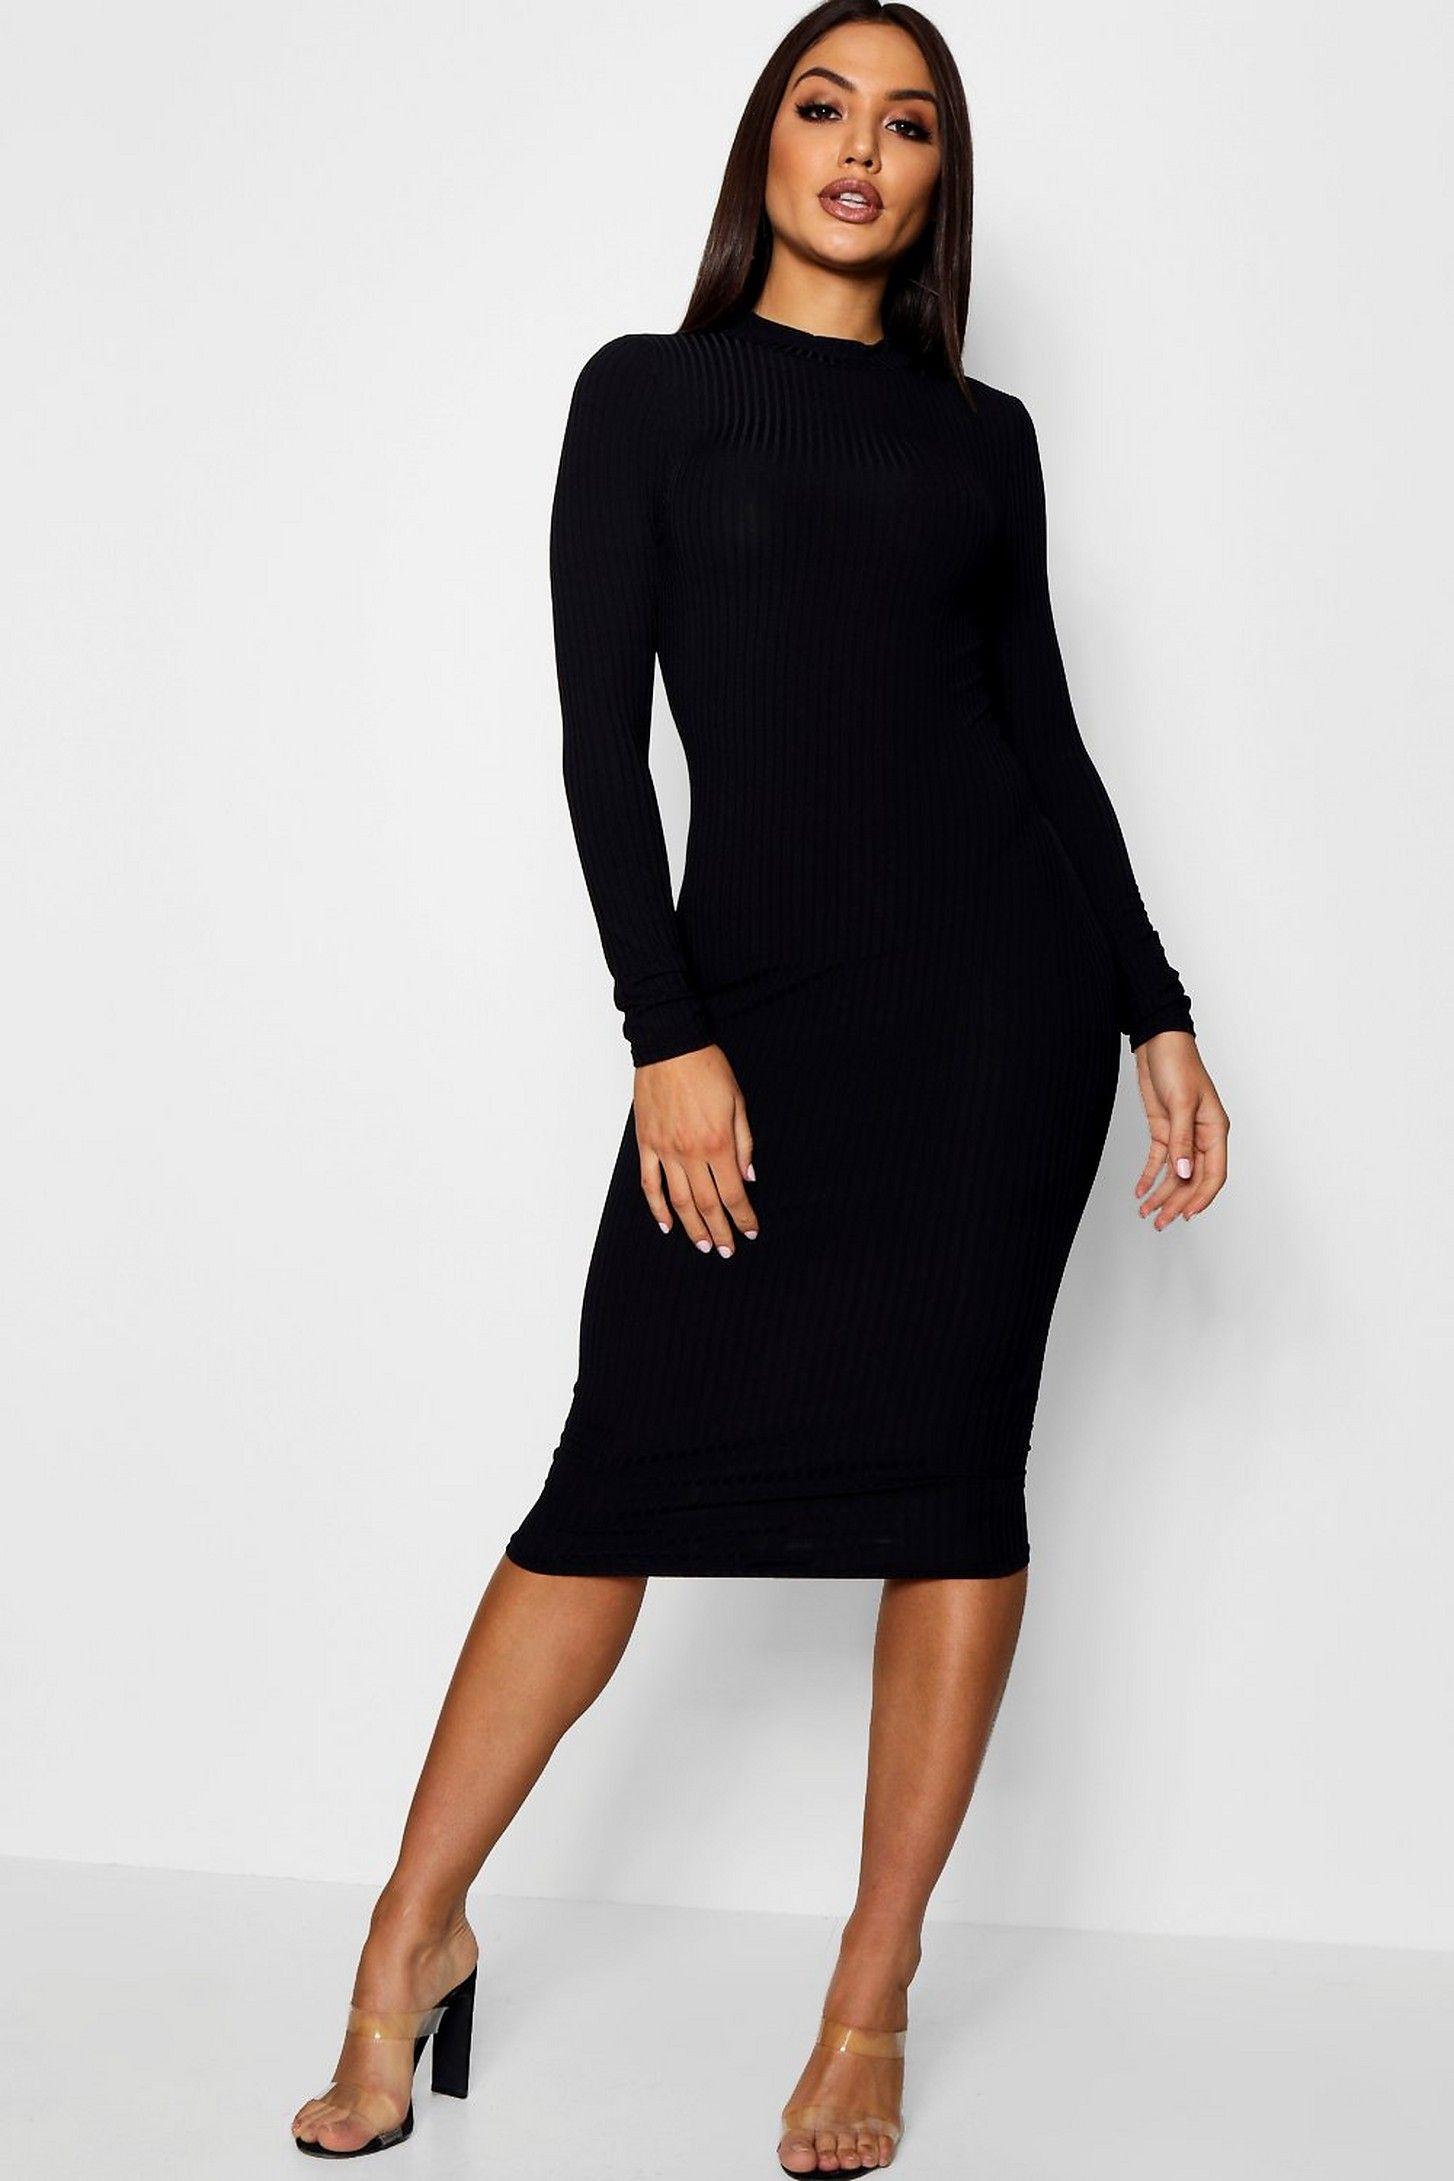 Ribbed High Neck Long Sleeved Midi Dress boohoo in 2020